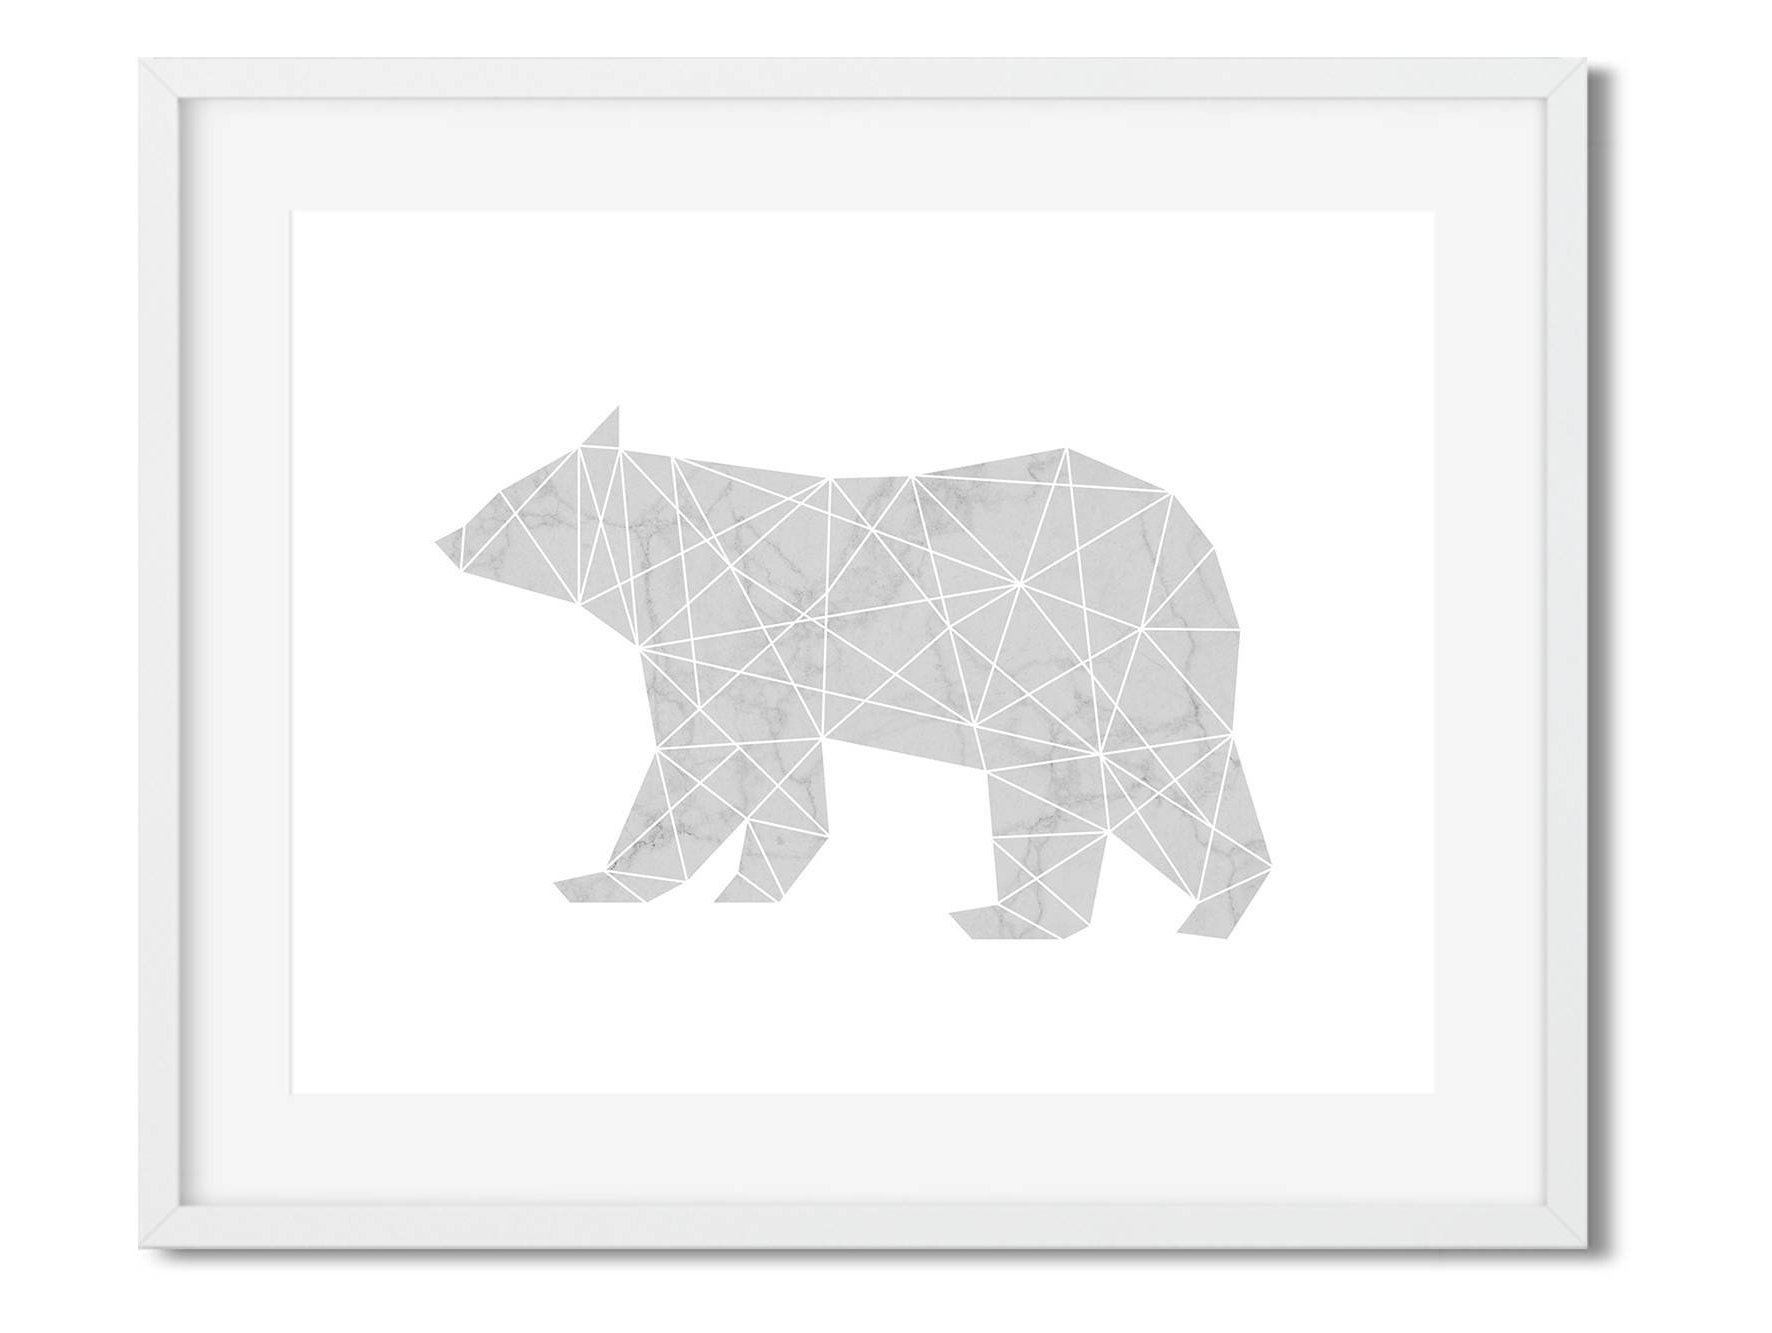 Oso polar silueta geométrica animales nórdicos / impresión | Etsy